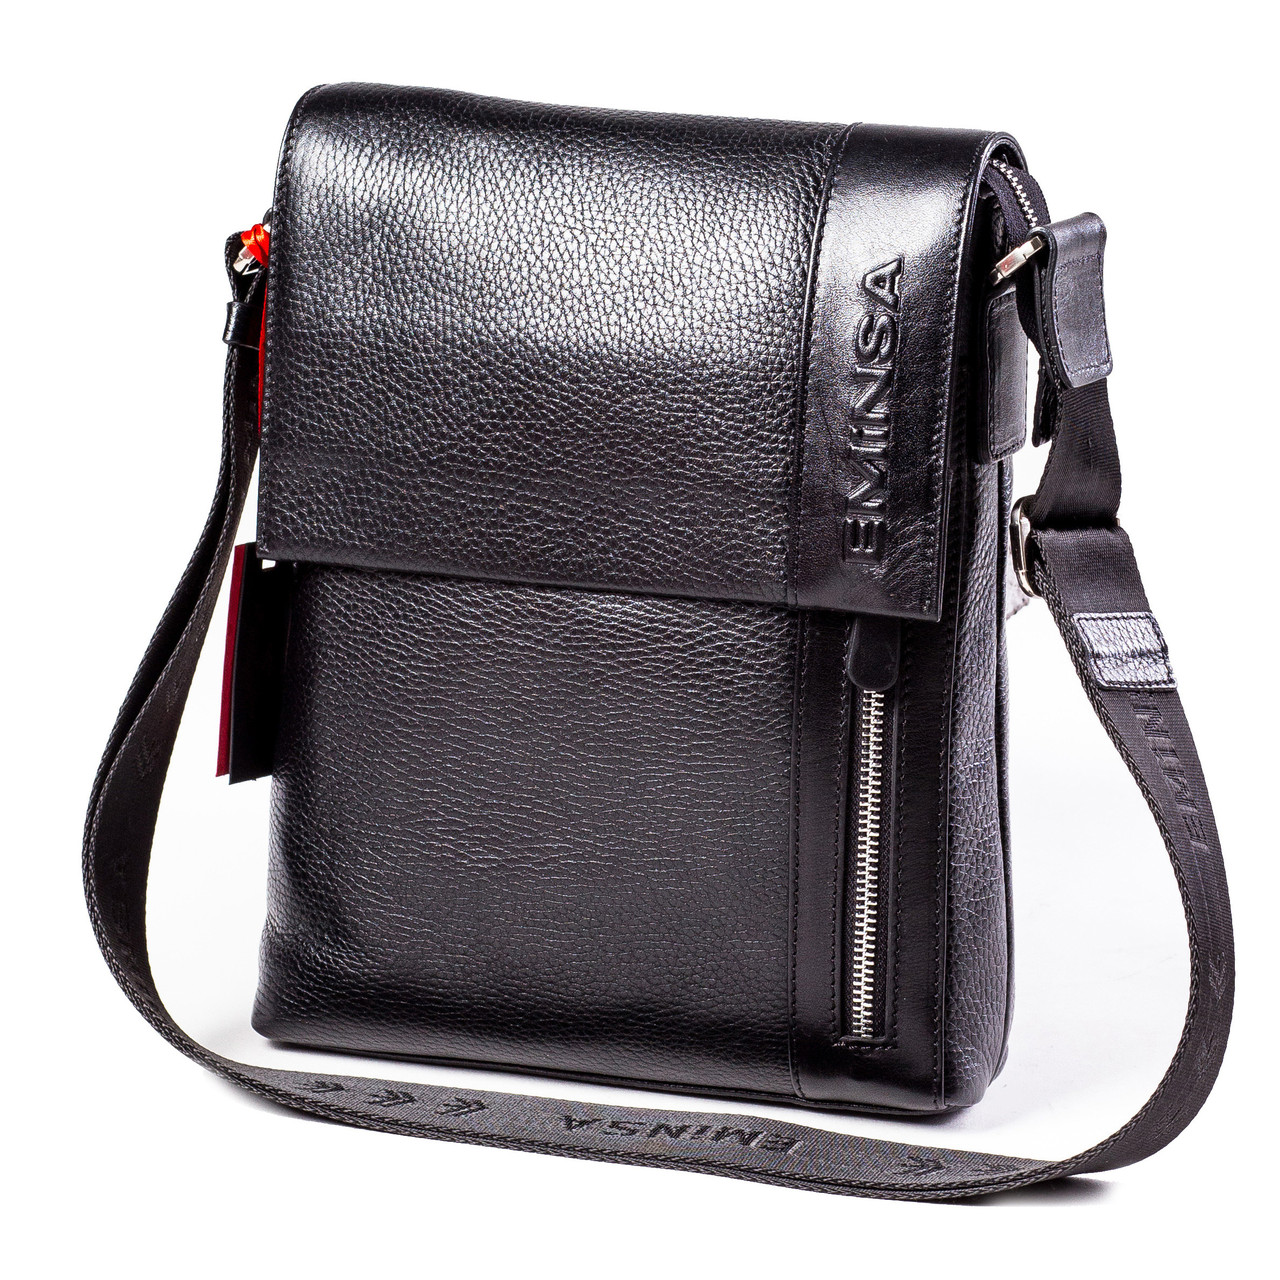 Мужская сумка кожаная черная Eminsa 6044-37-1